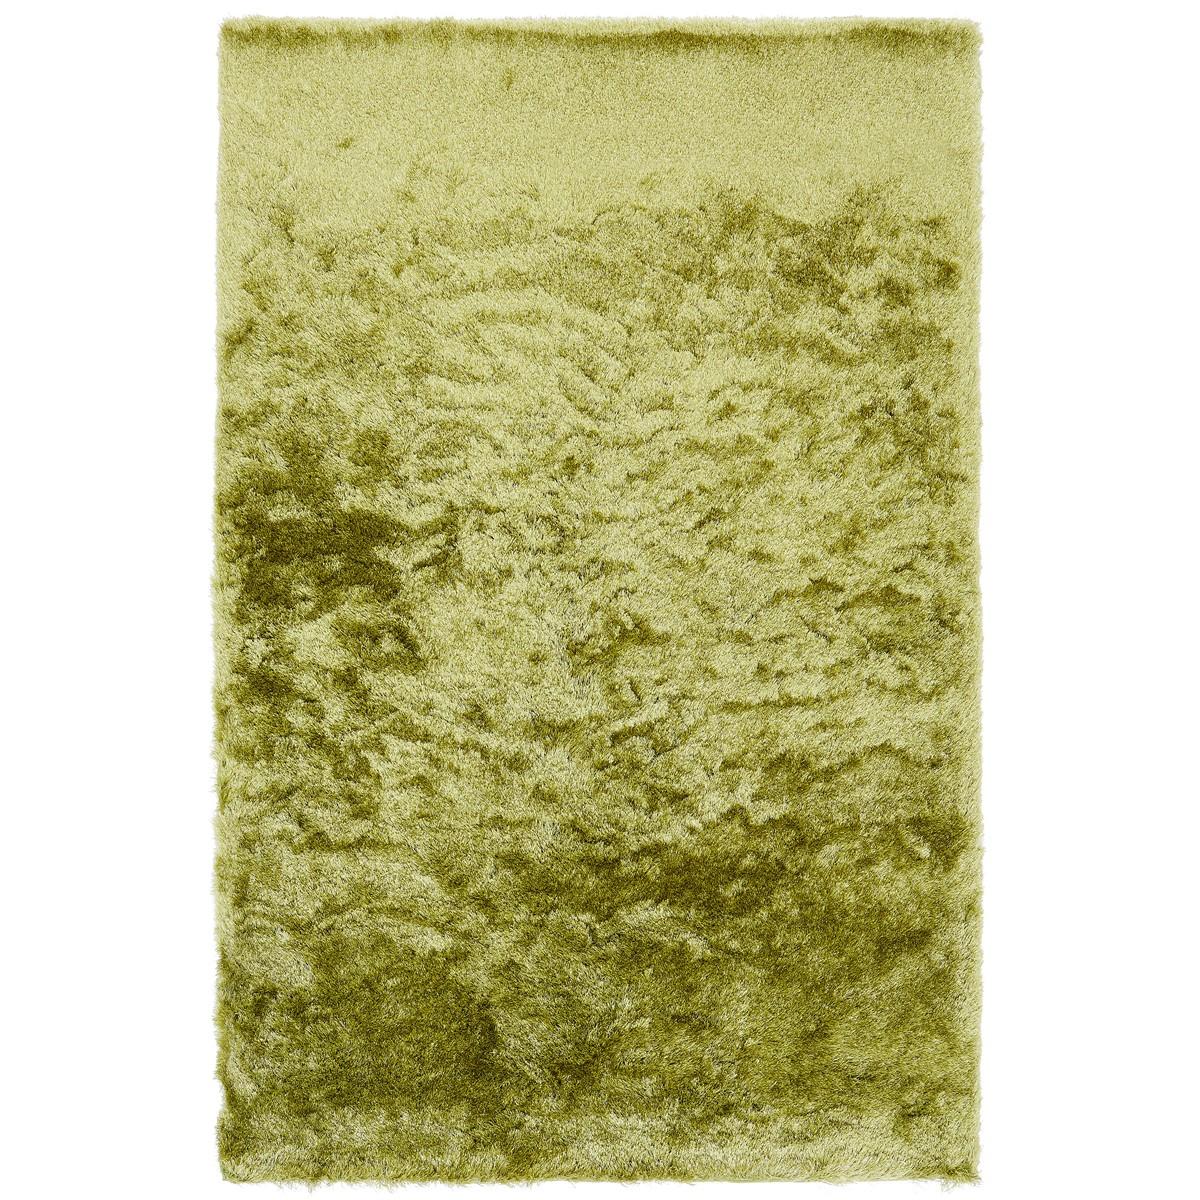 Tapis shaggy doux en Polyester Vert clair 160x230 cm